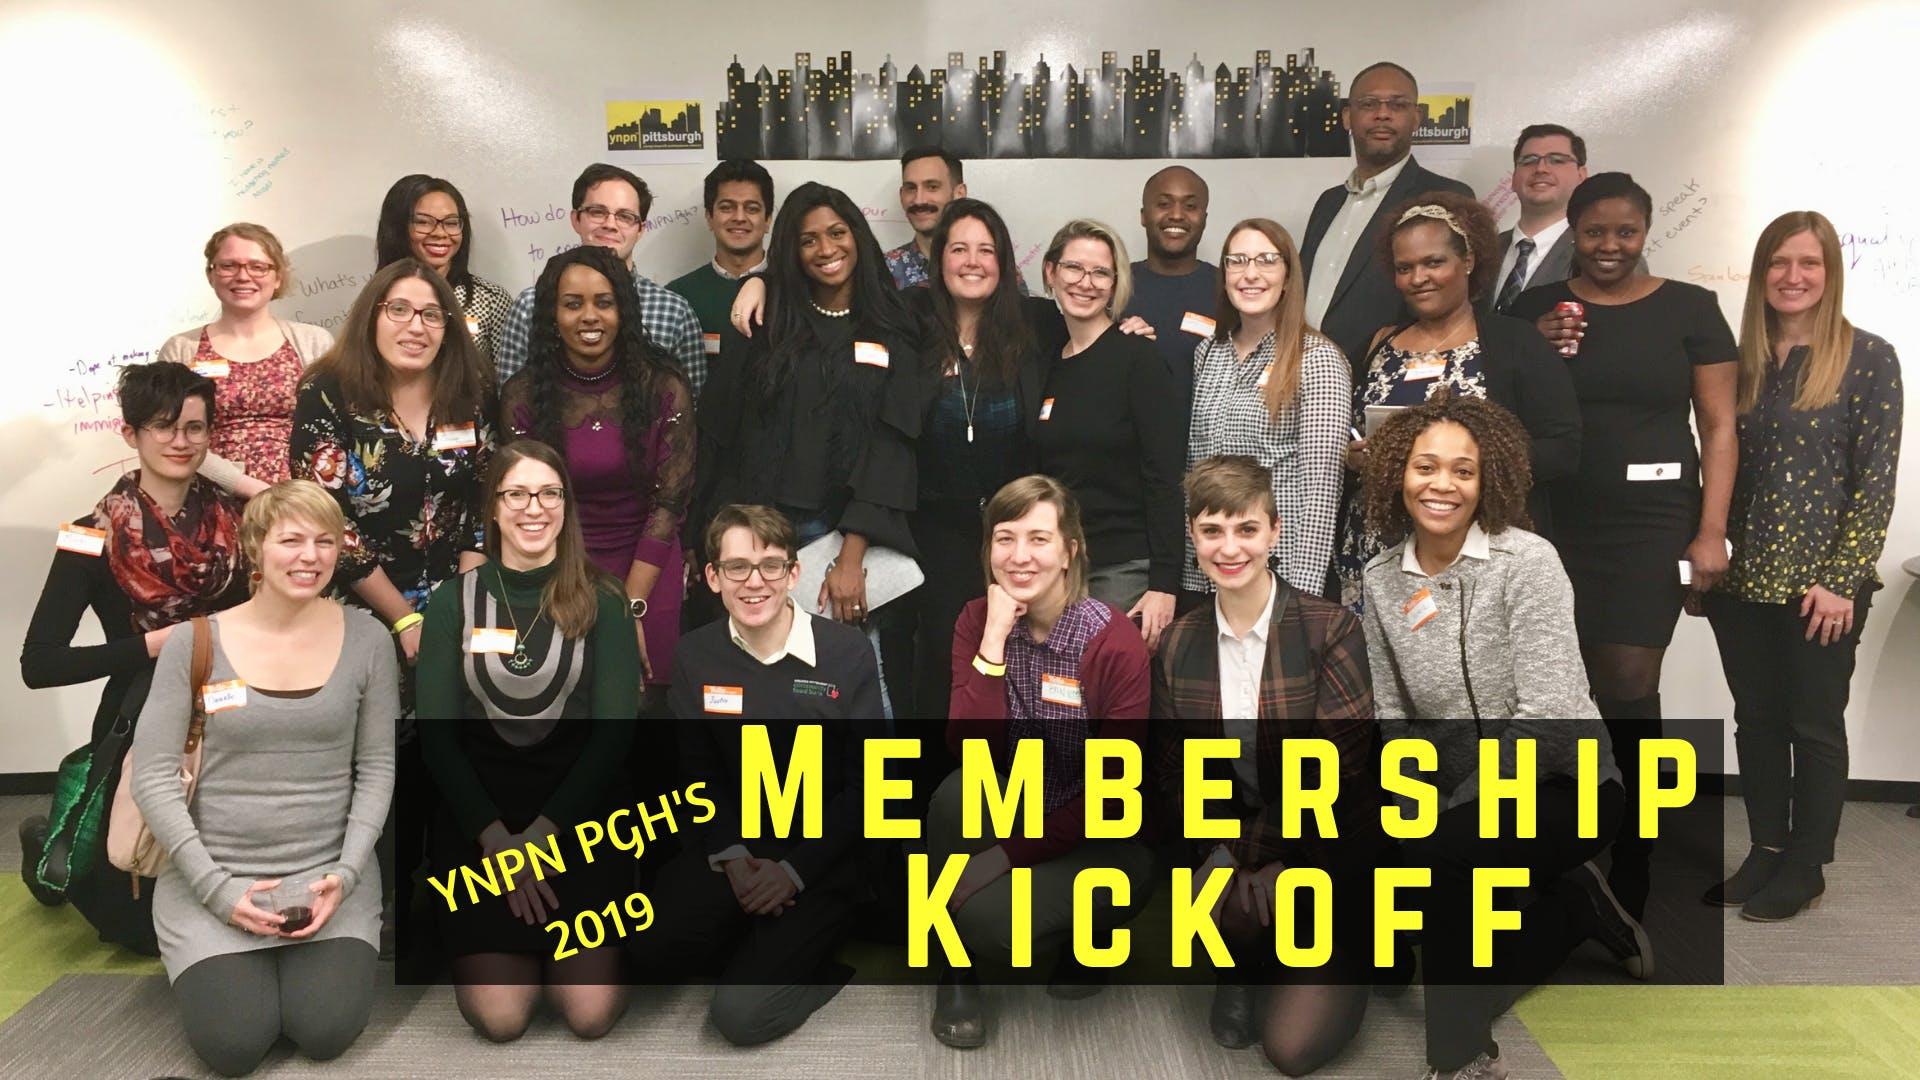 YNPN Pgh's 2019 Membership Kickoff